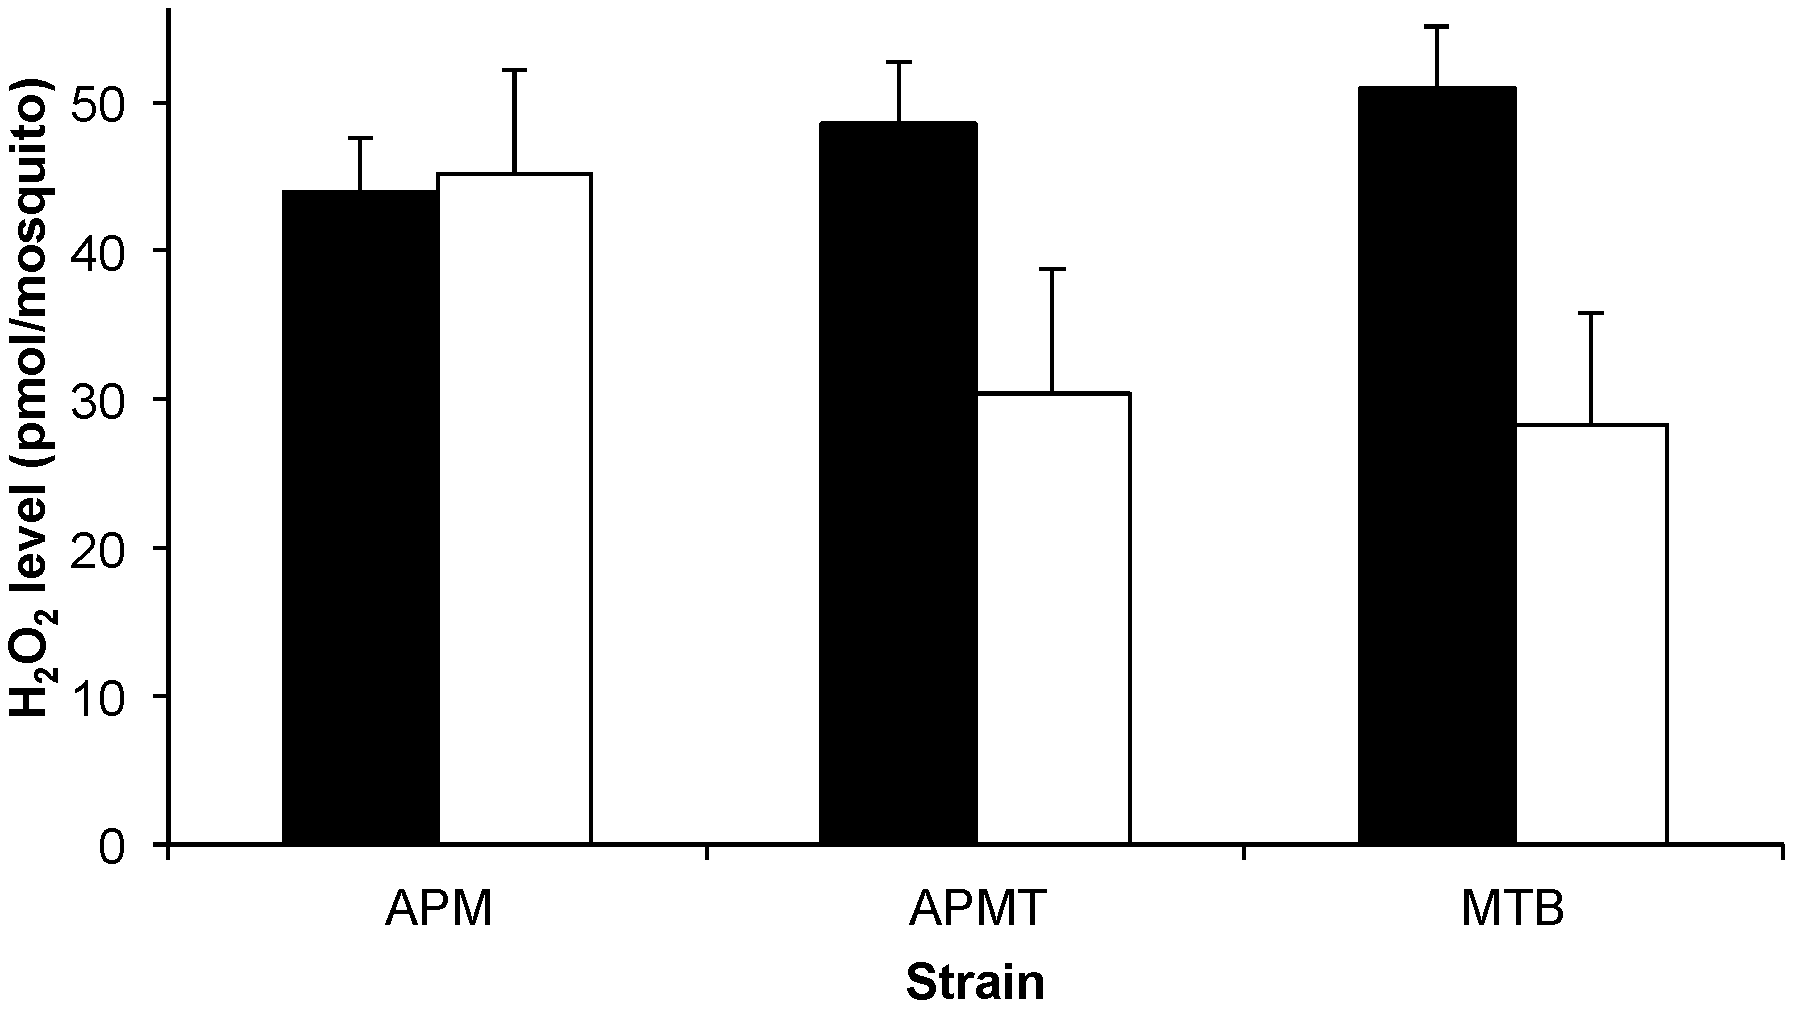 ROS levels in <i>Ae. polynesiensis</i> strains.